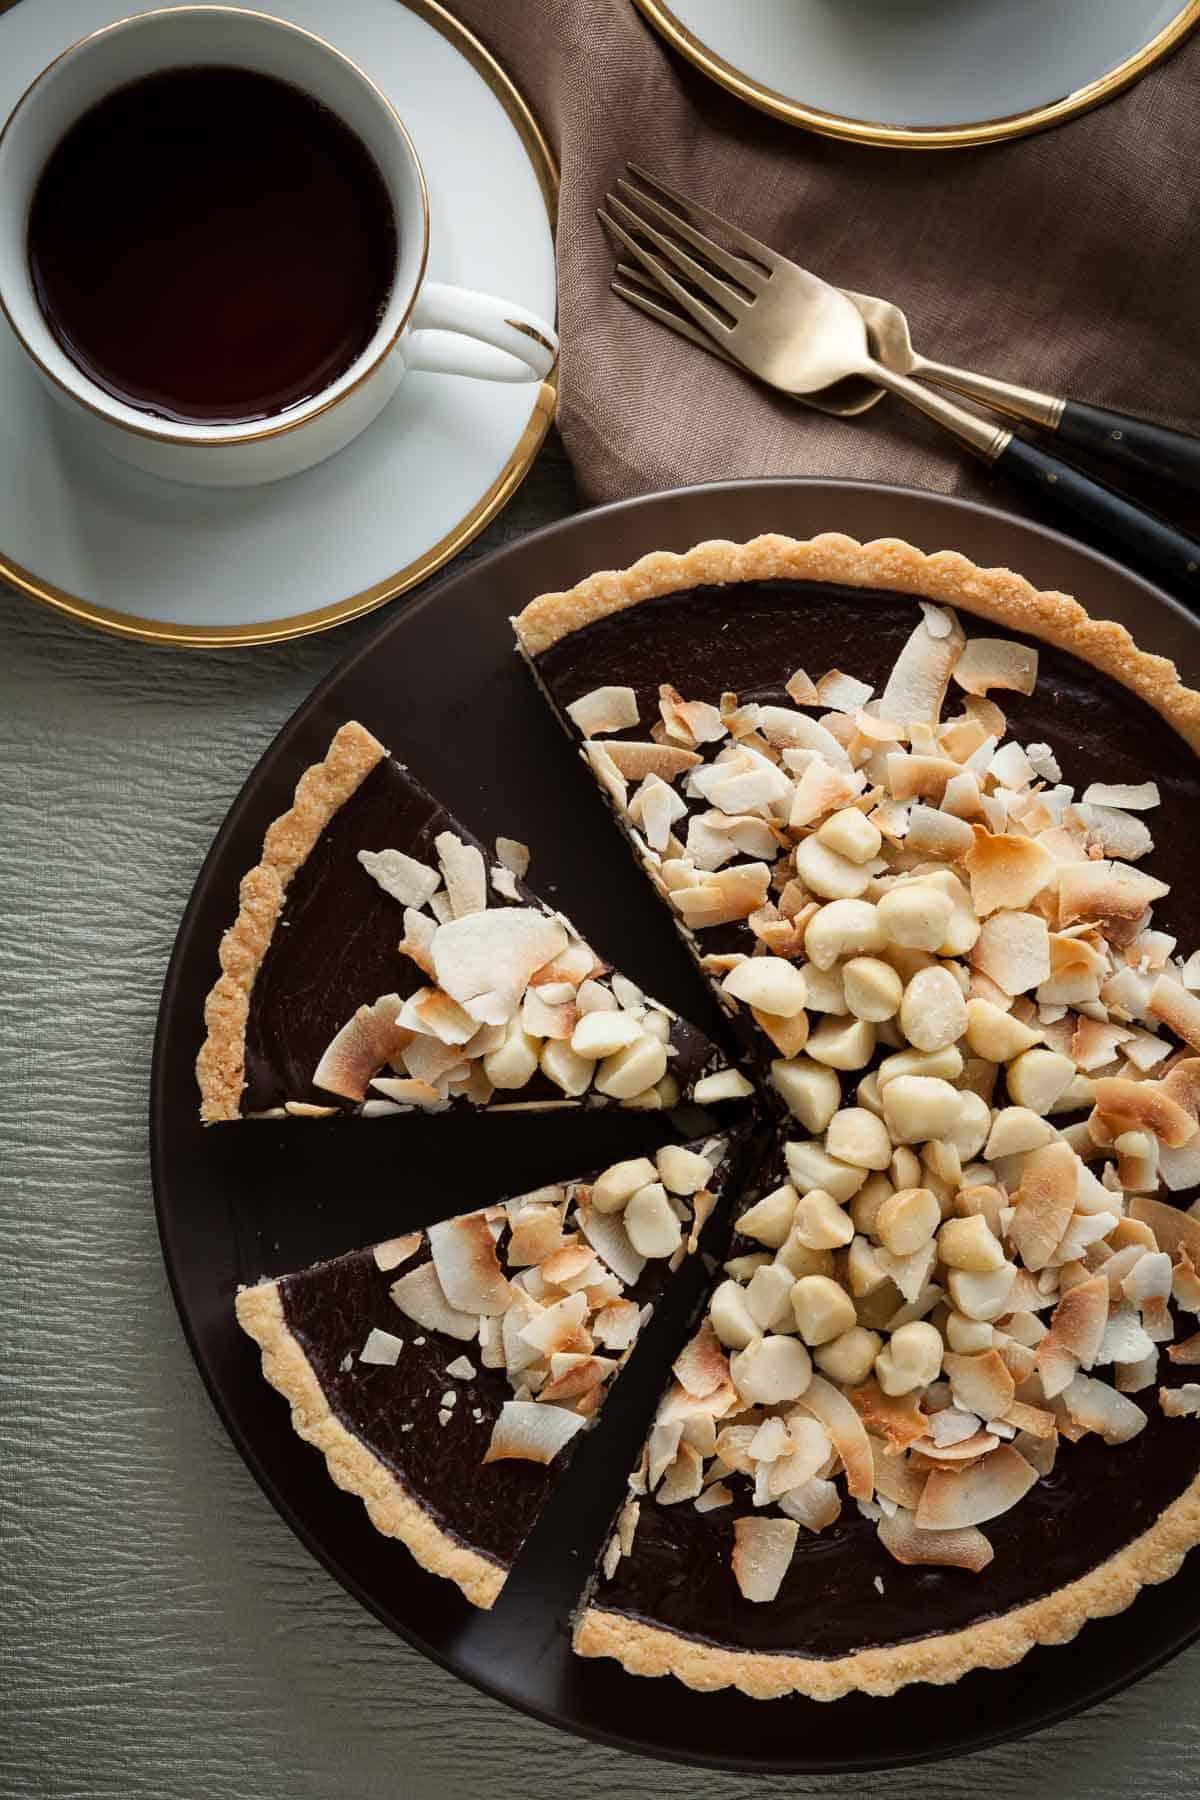 Chocolate Coconut Macadamia Nut Tart Gluten Free Paleo